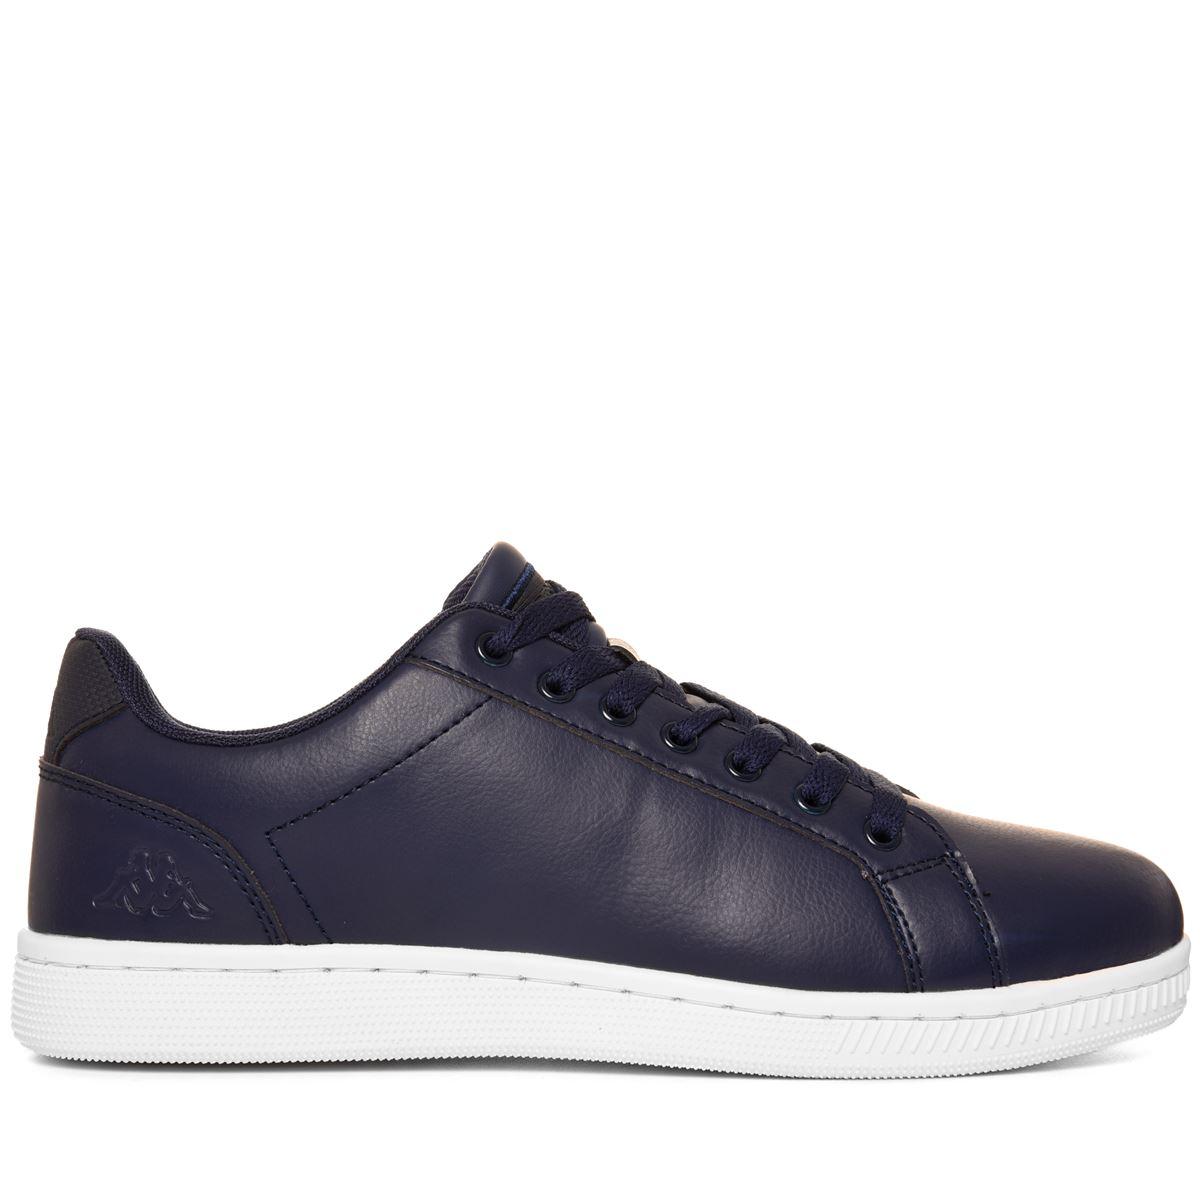 Kappa-Scarpe-Sneakers-Uomo-Donna-LOGO-GALTER-5-Camminata-Basso miniatuur 3